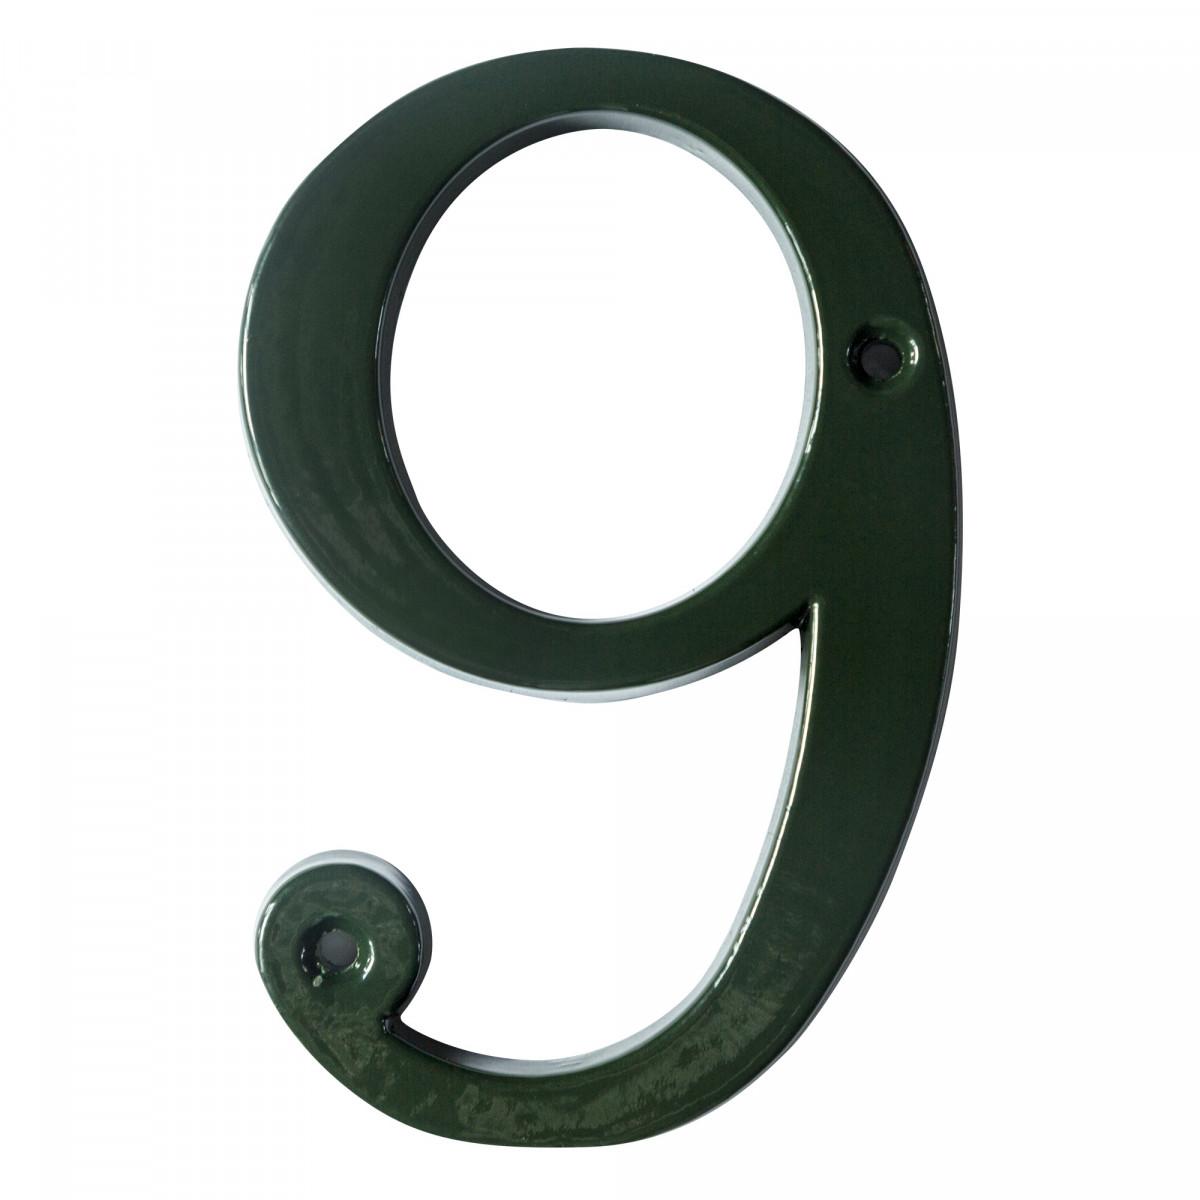 Huisnummer 9 (5859) - KS Verlichting - Huisnummers